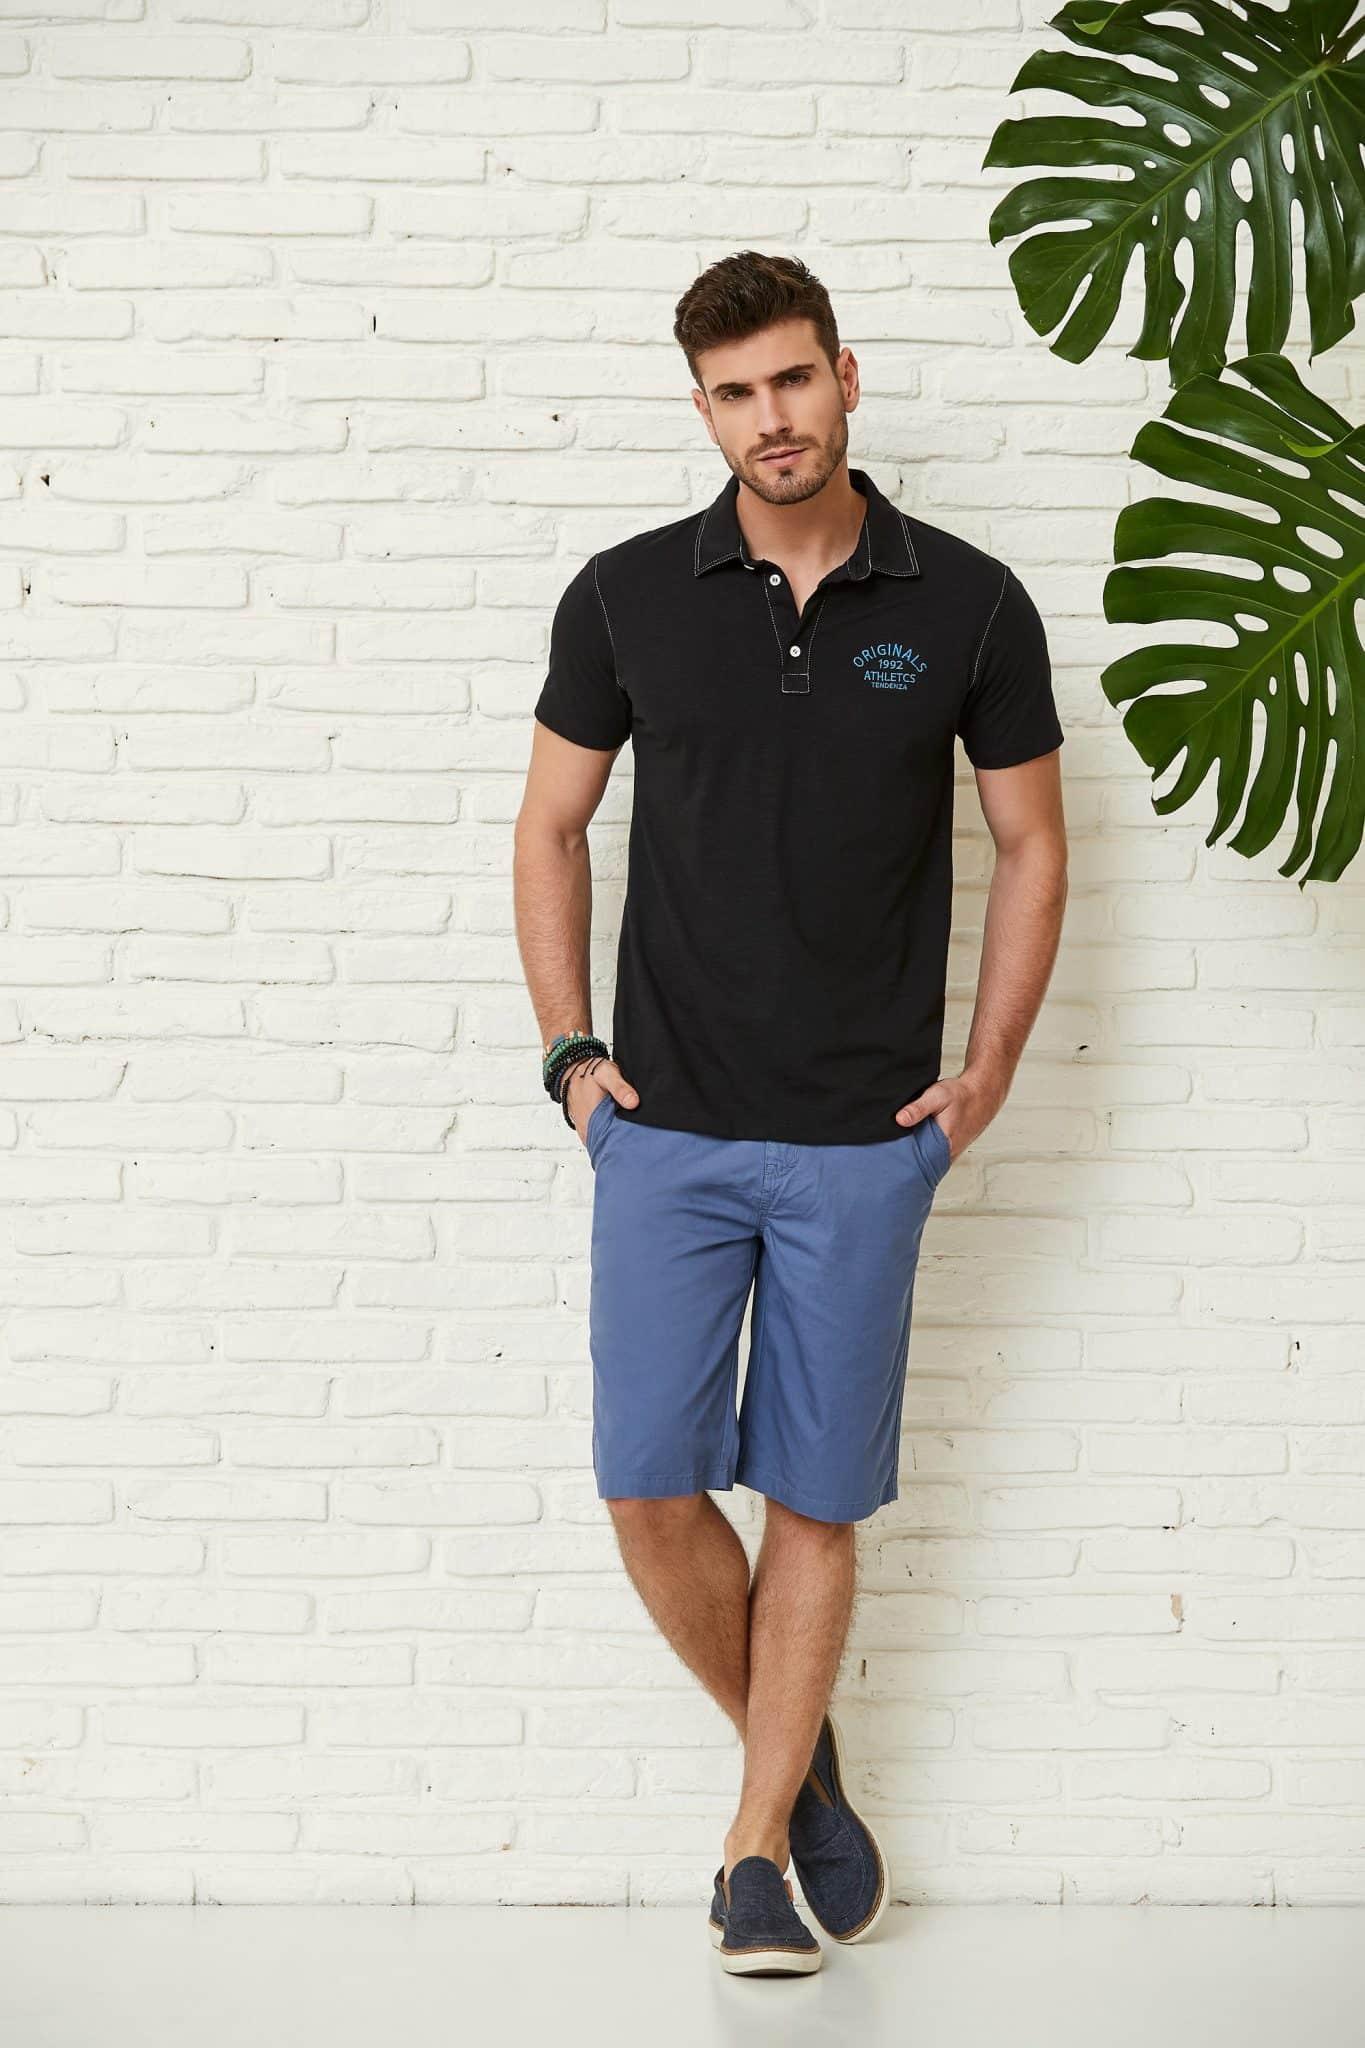 blusa polo preta combinada com bermuda azul